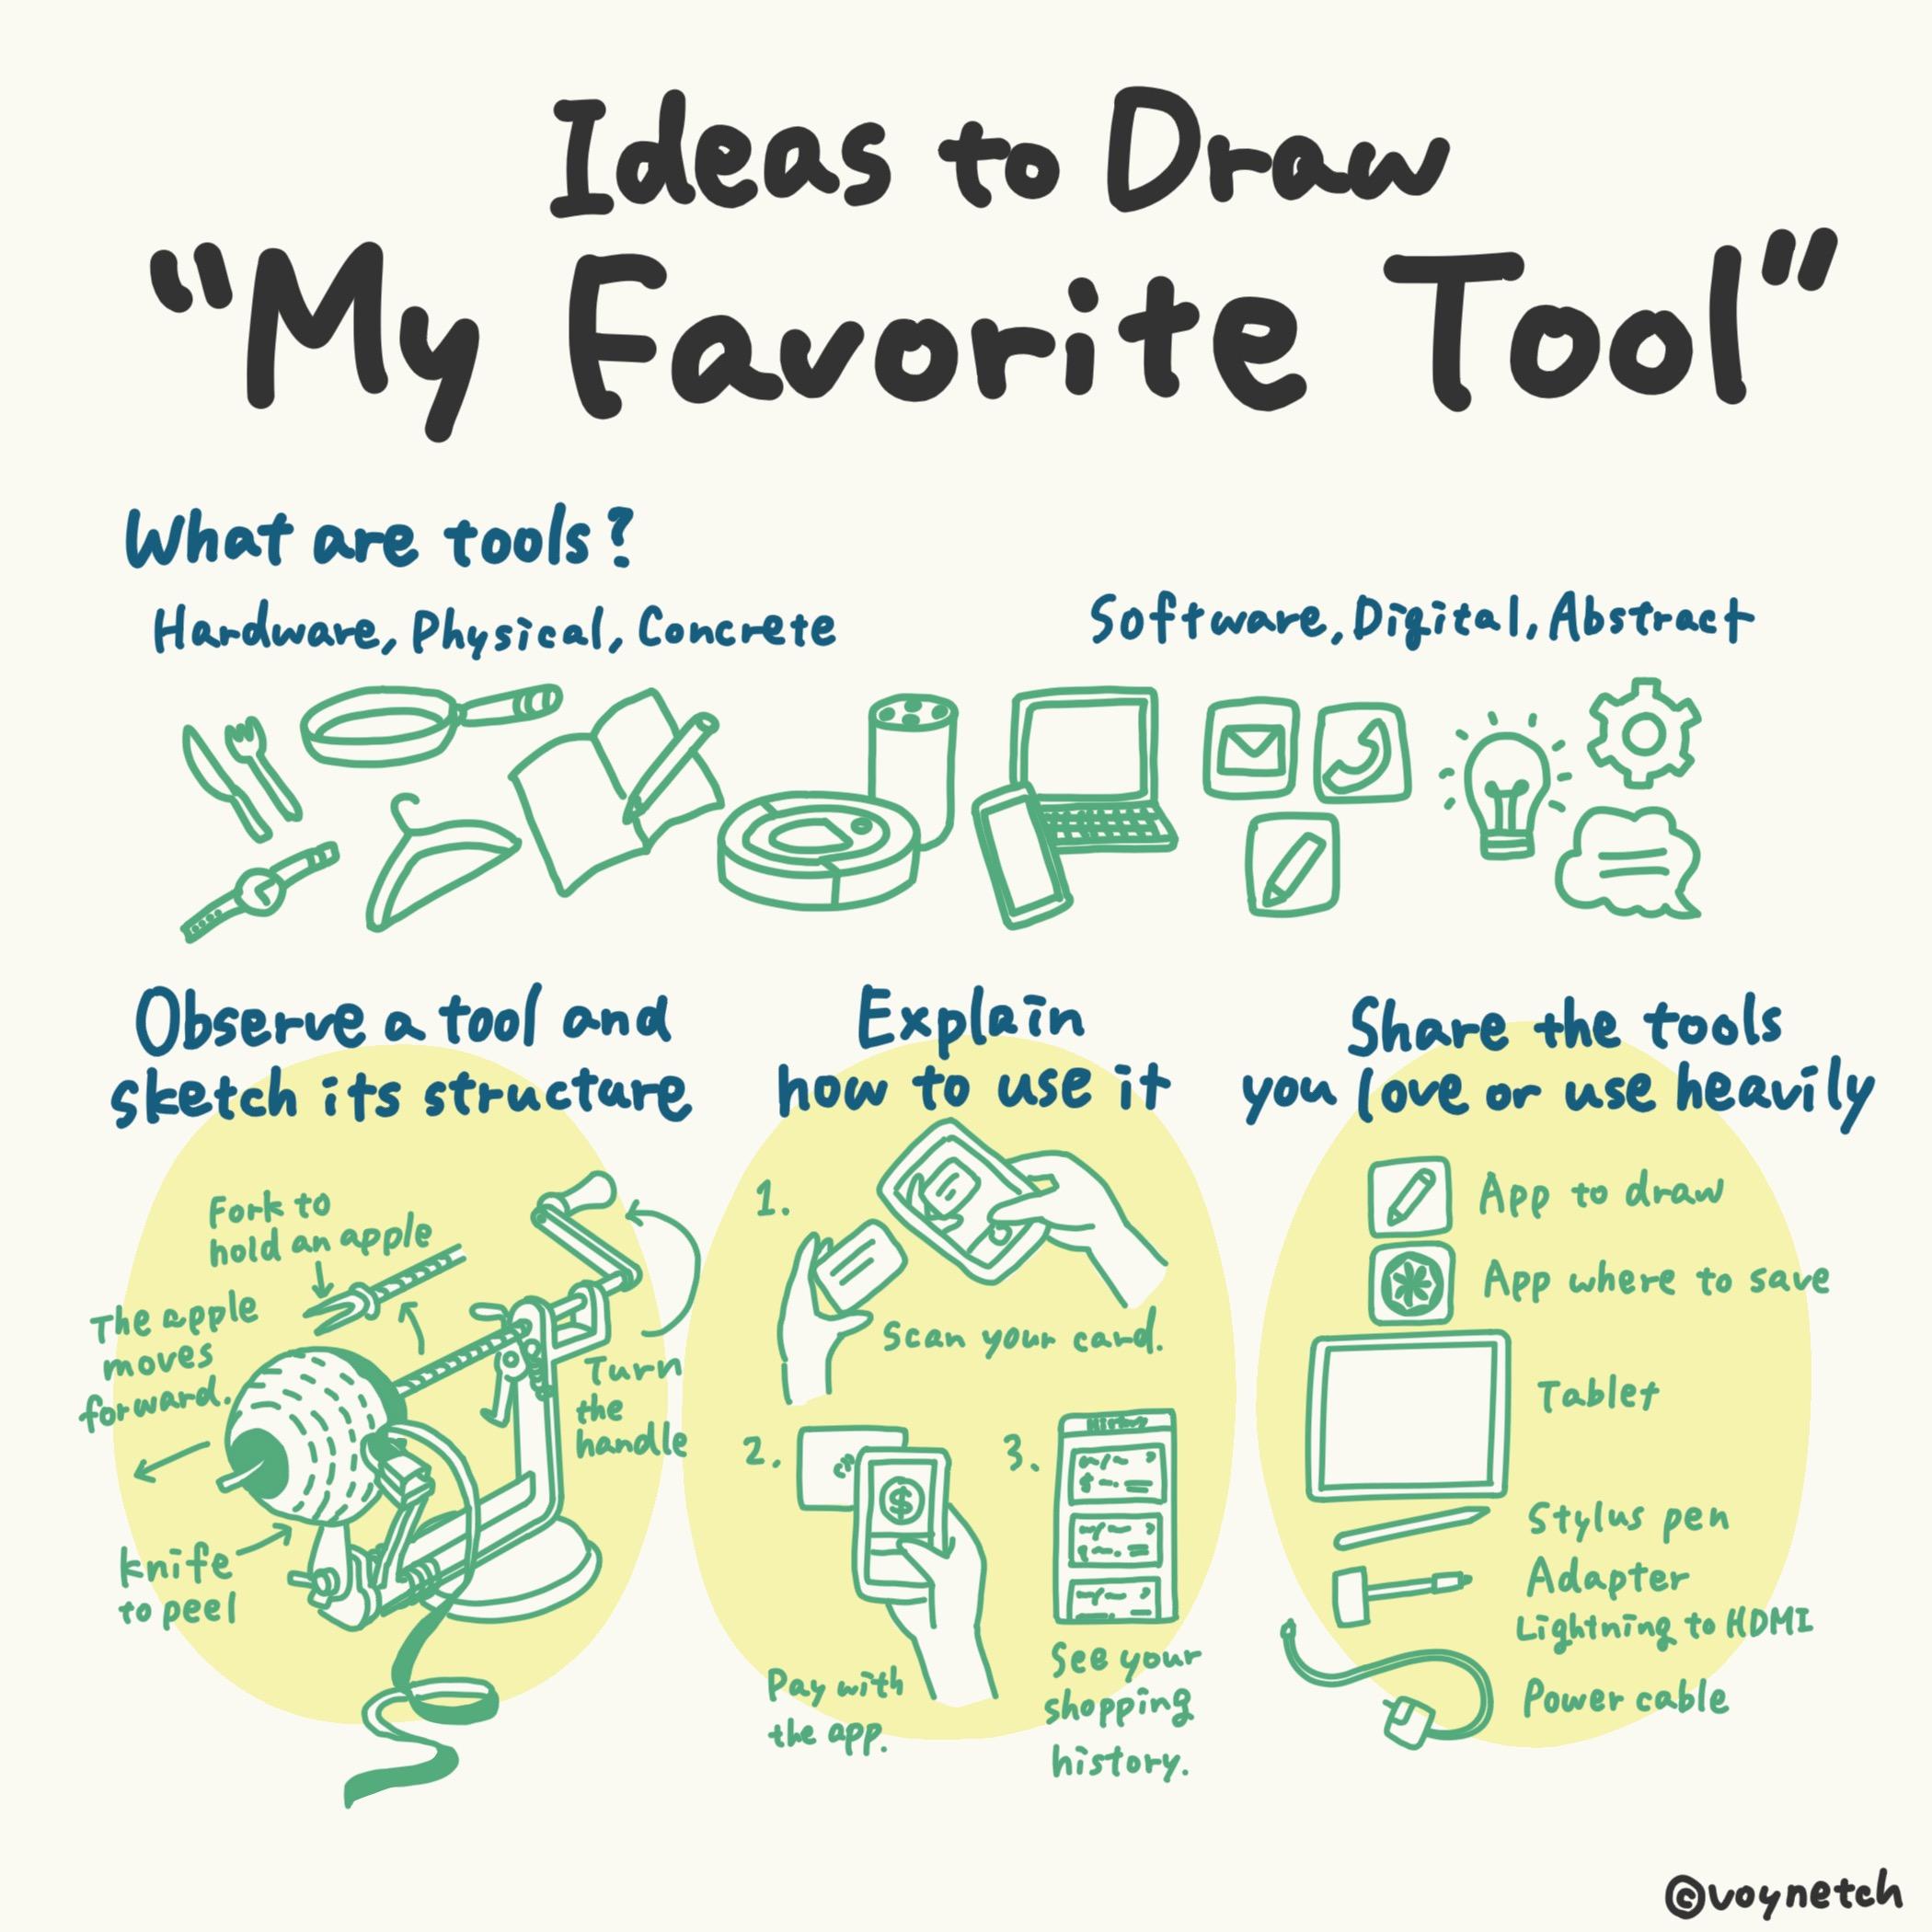 "Ideas to Draw ""My Favorite Tool"" Image"